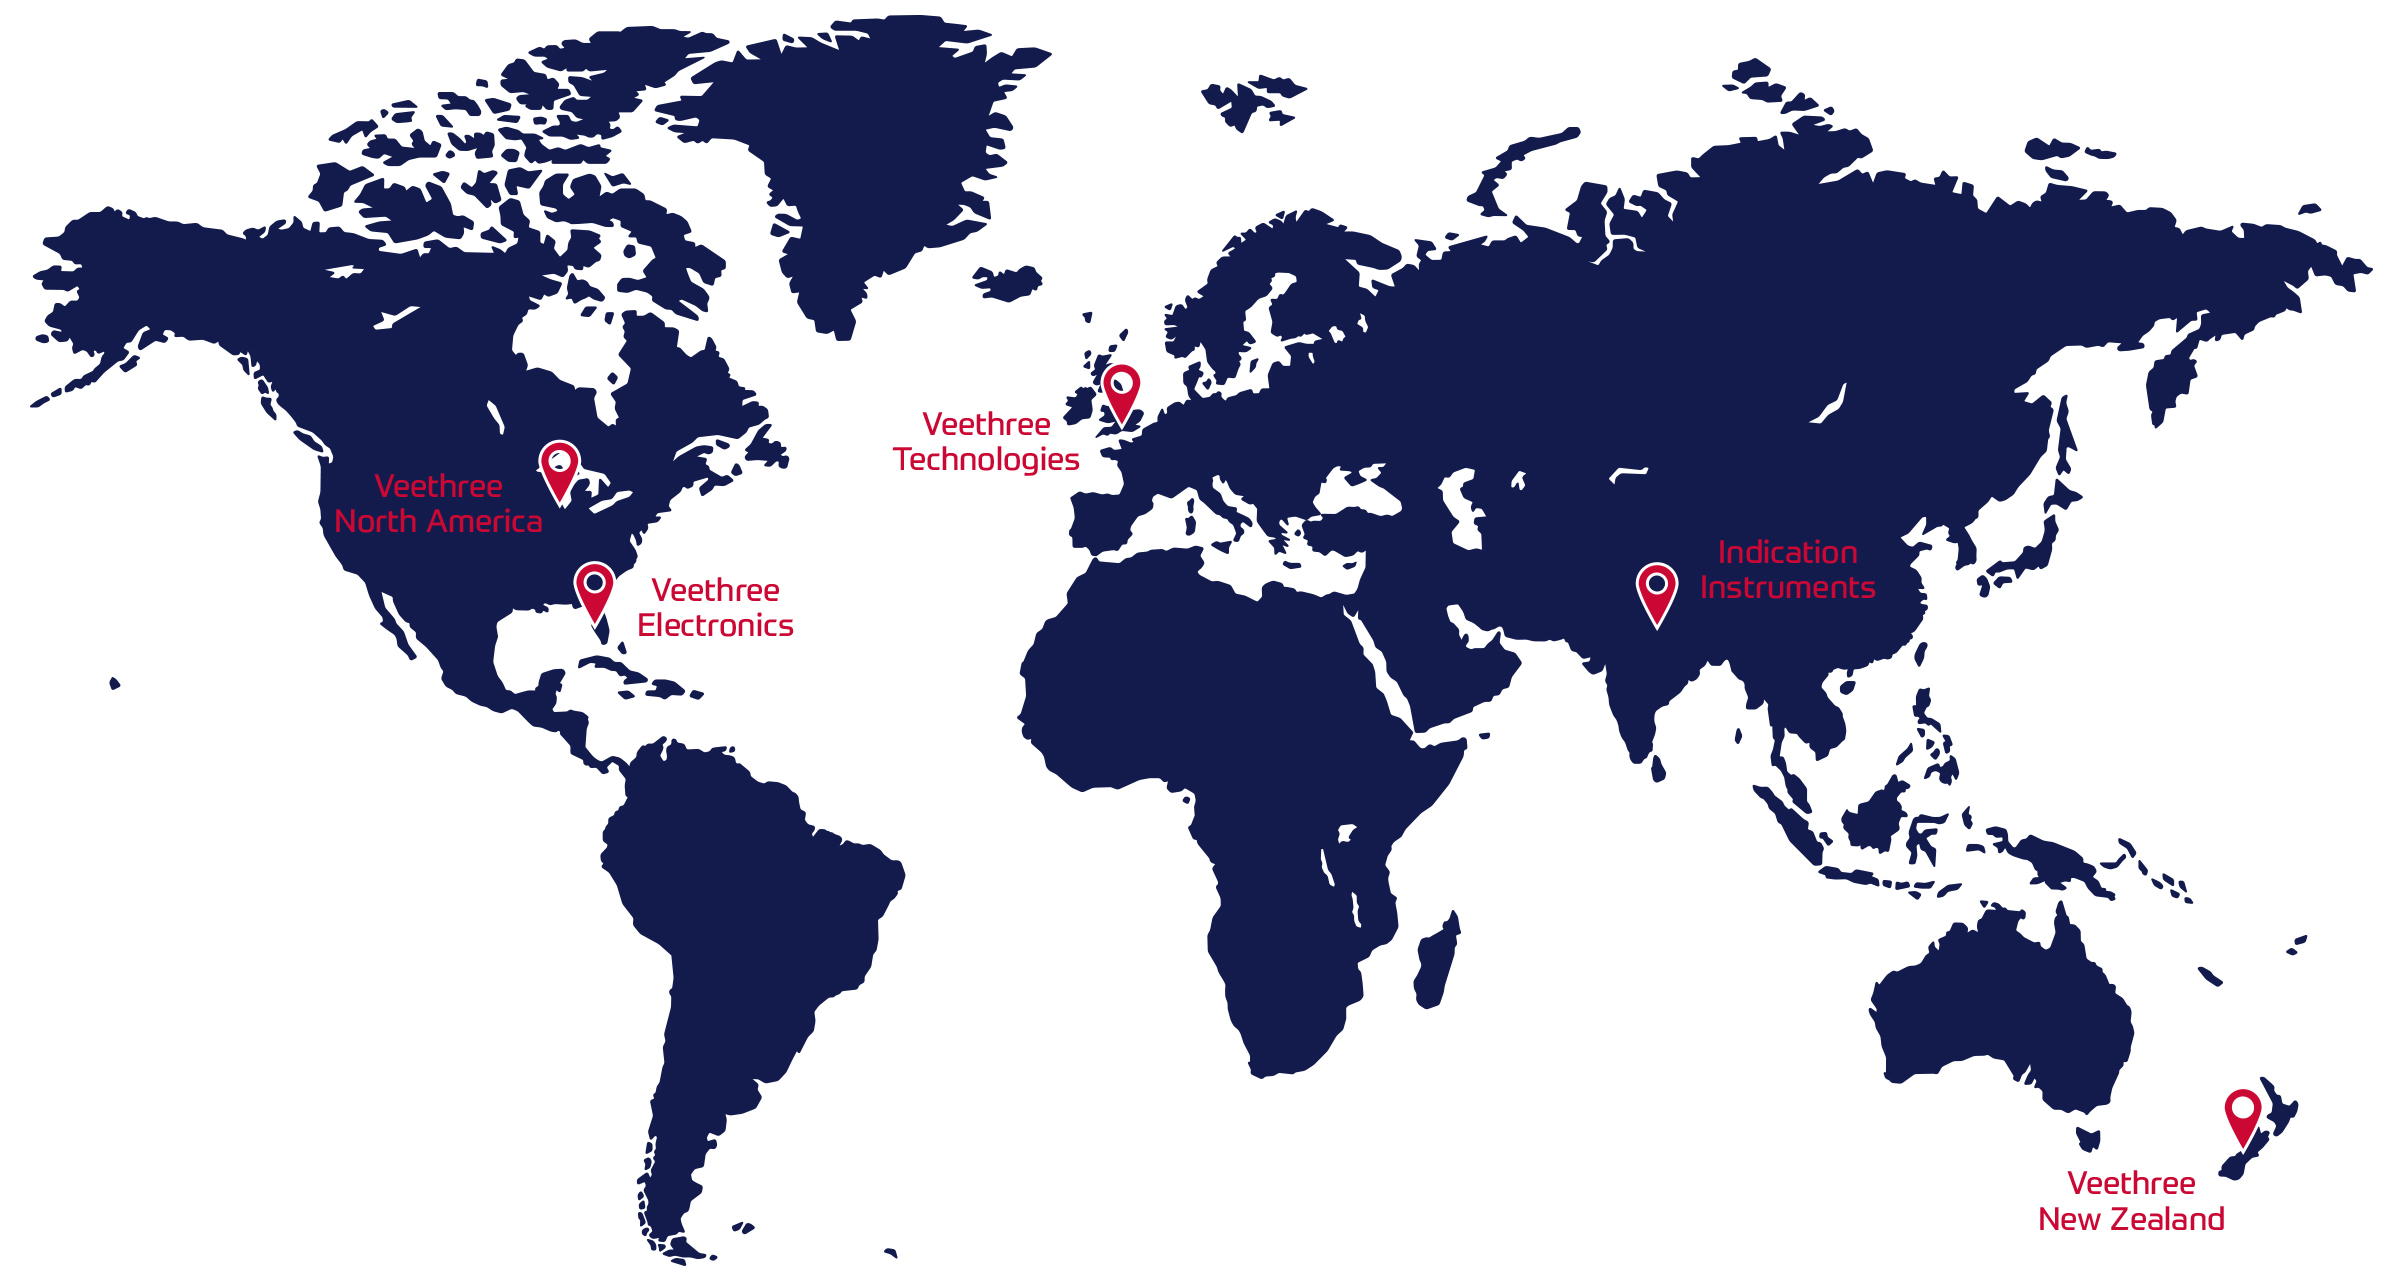 Veethree Group Locations